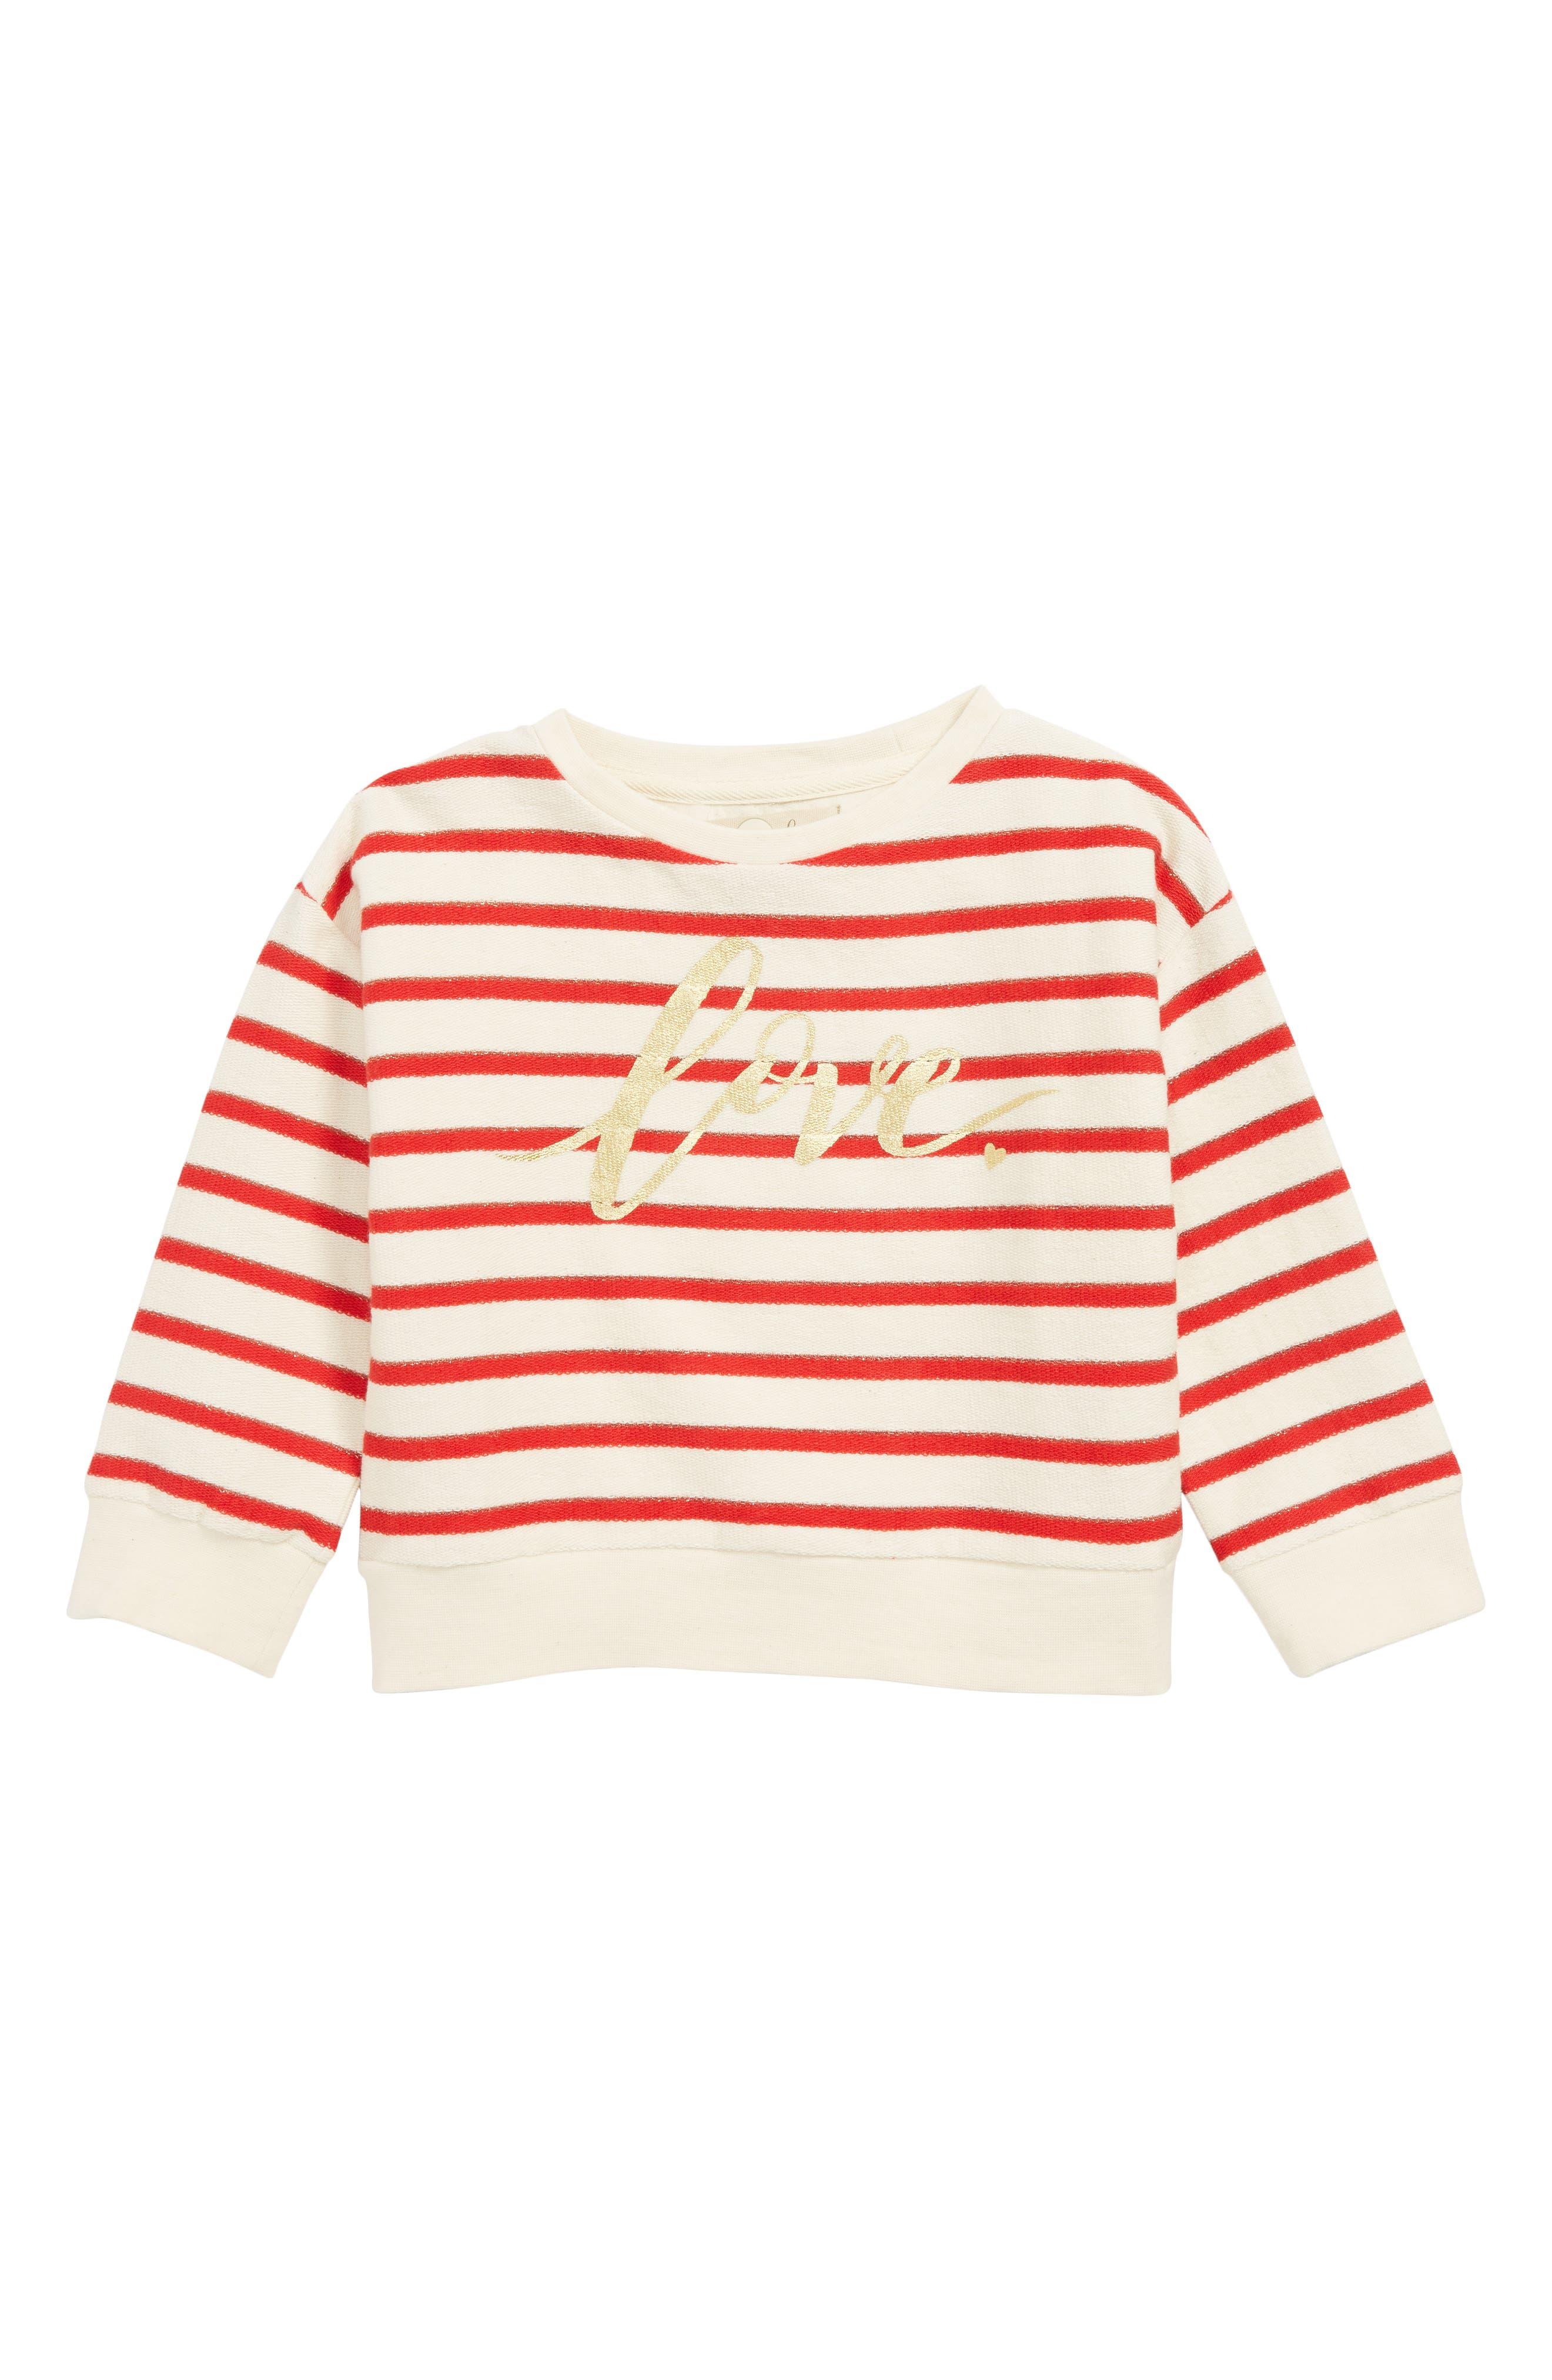 PEEK AREN'T YOU CURIOUS Love Sweatshirt, Main, color, RED